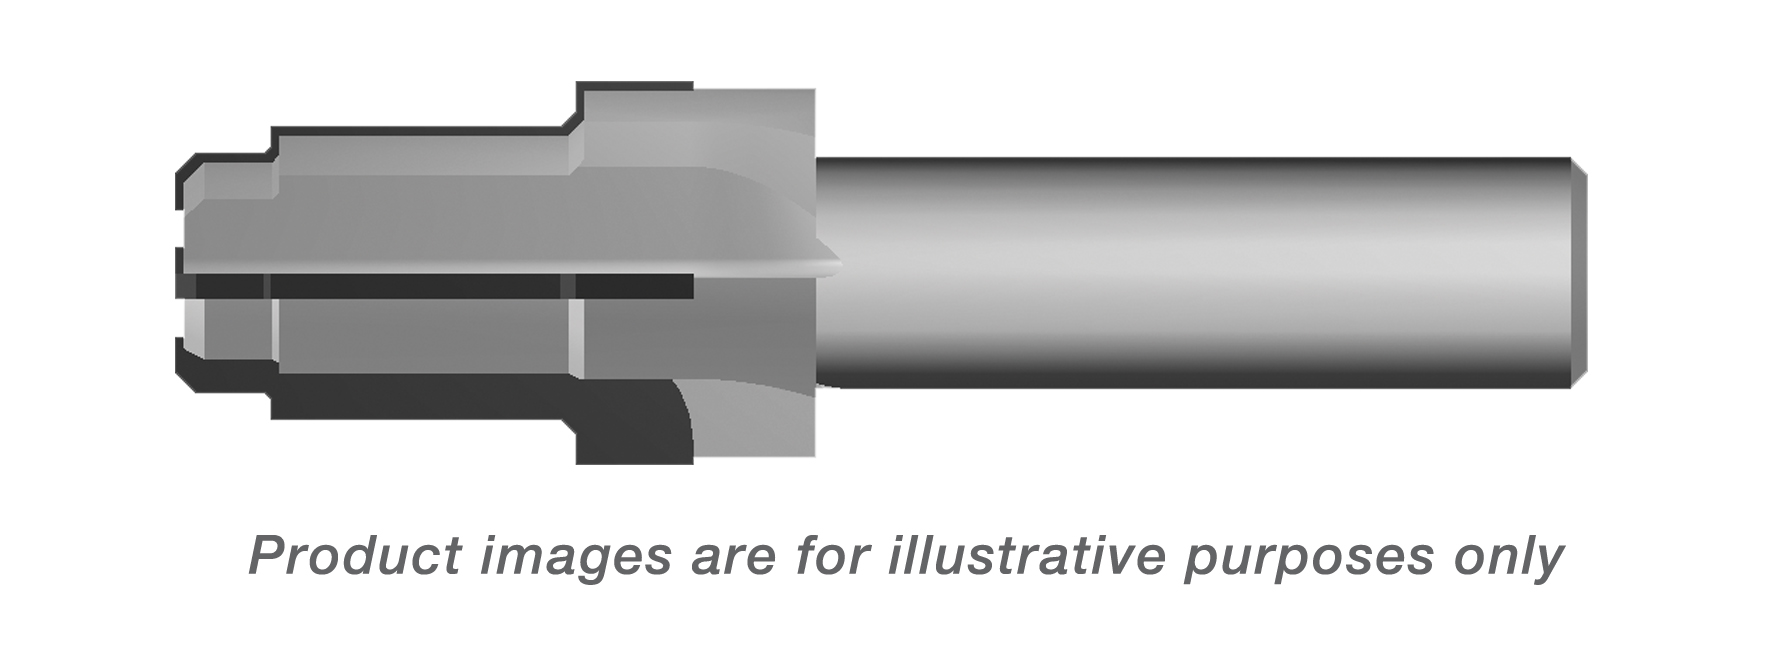 PORT TOOL CARBIDE TIPPED 1.8750-12UNJ-3B THREAD 1-1/4 TUBE (1.25 SHANK DIA. 4.63 OAL) ALTiN COATED